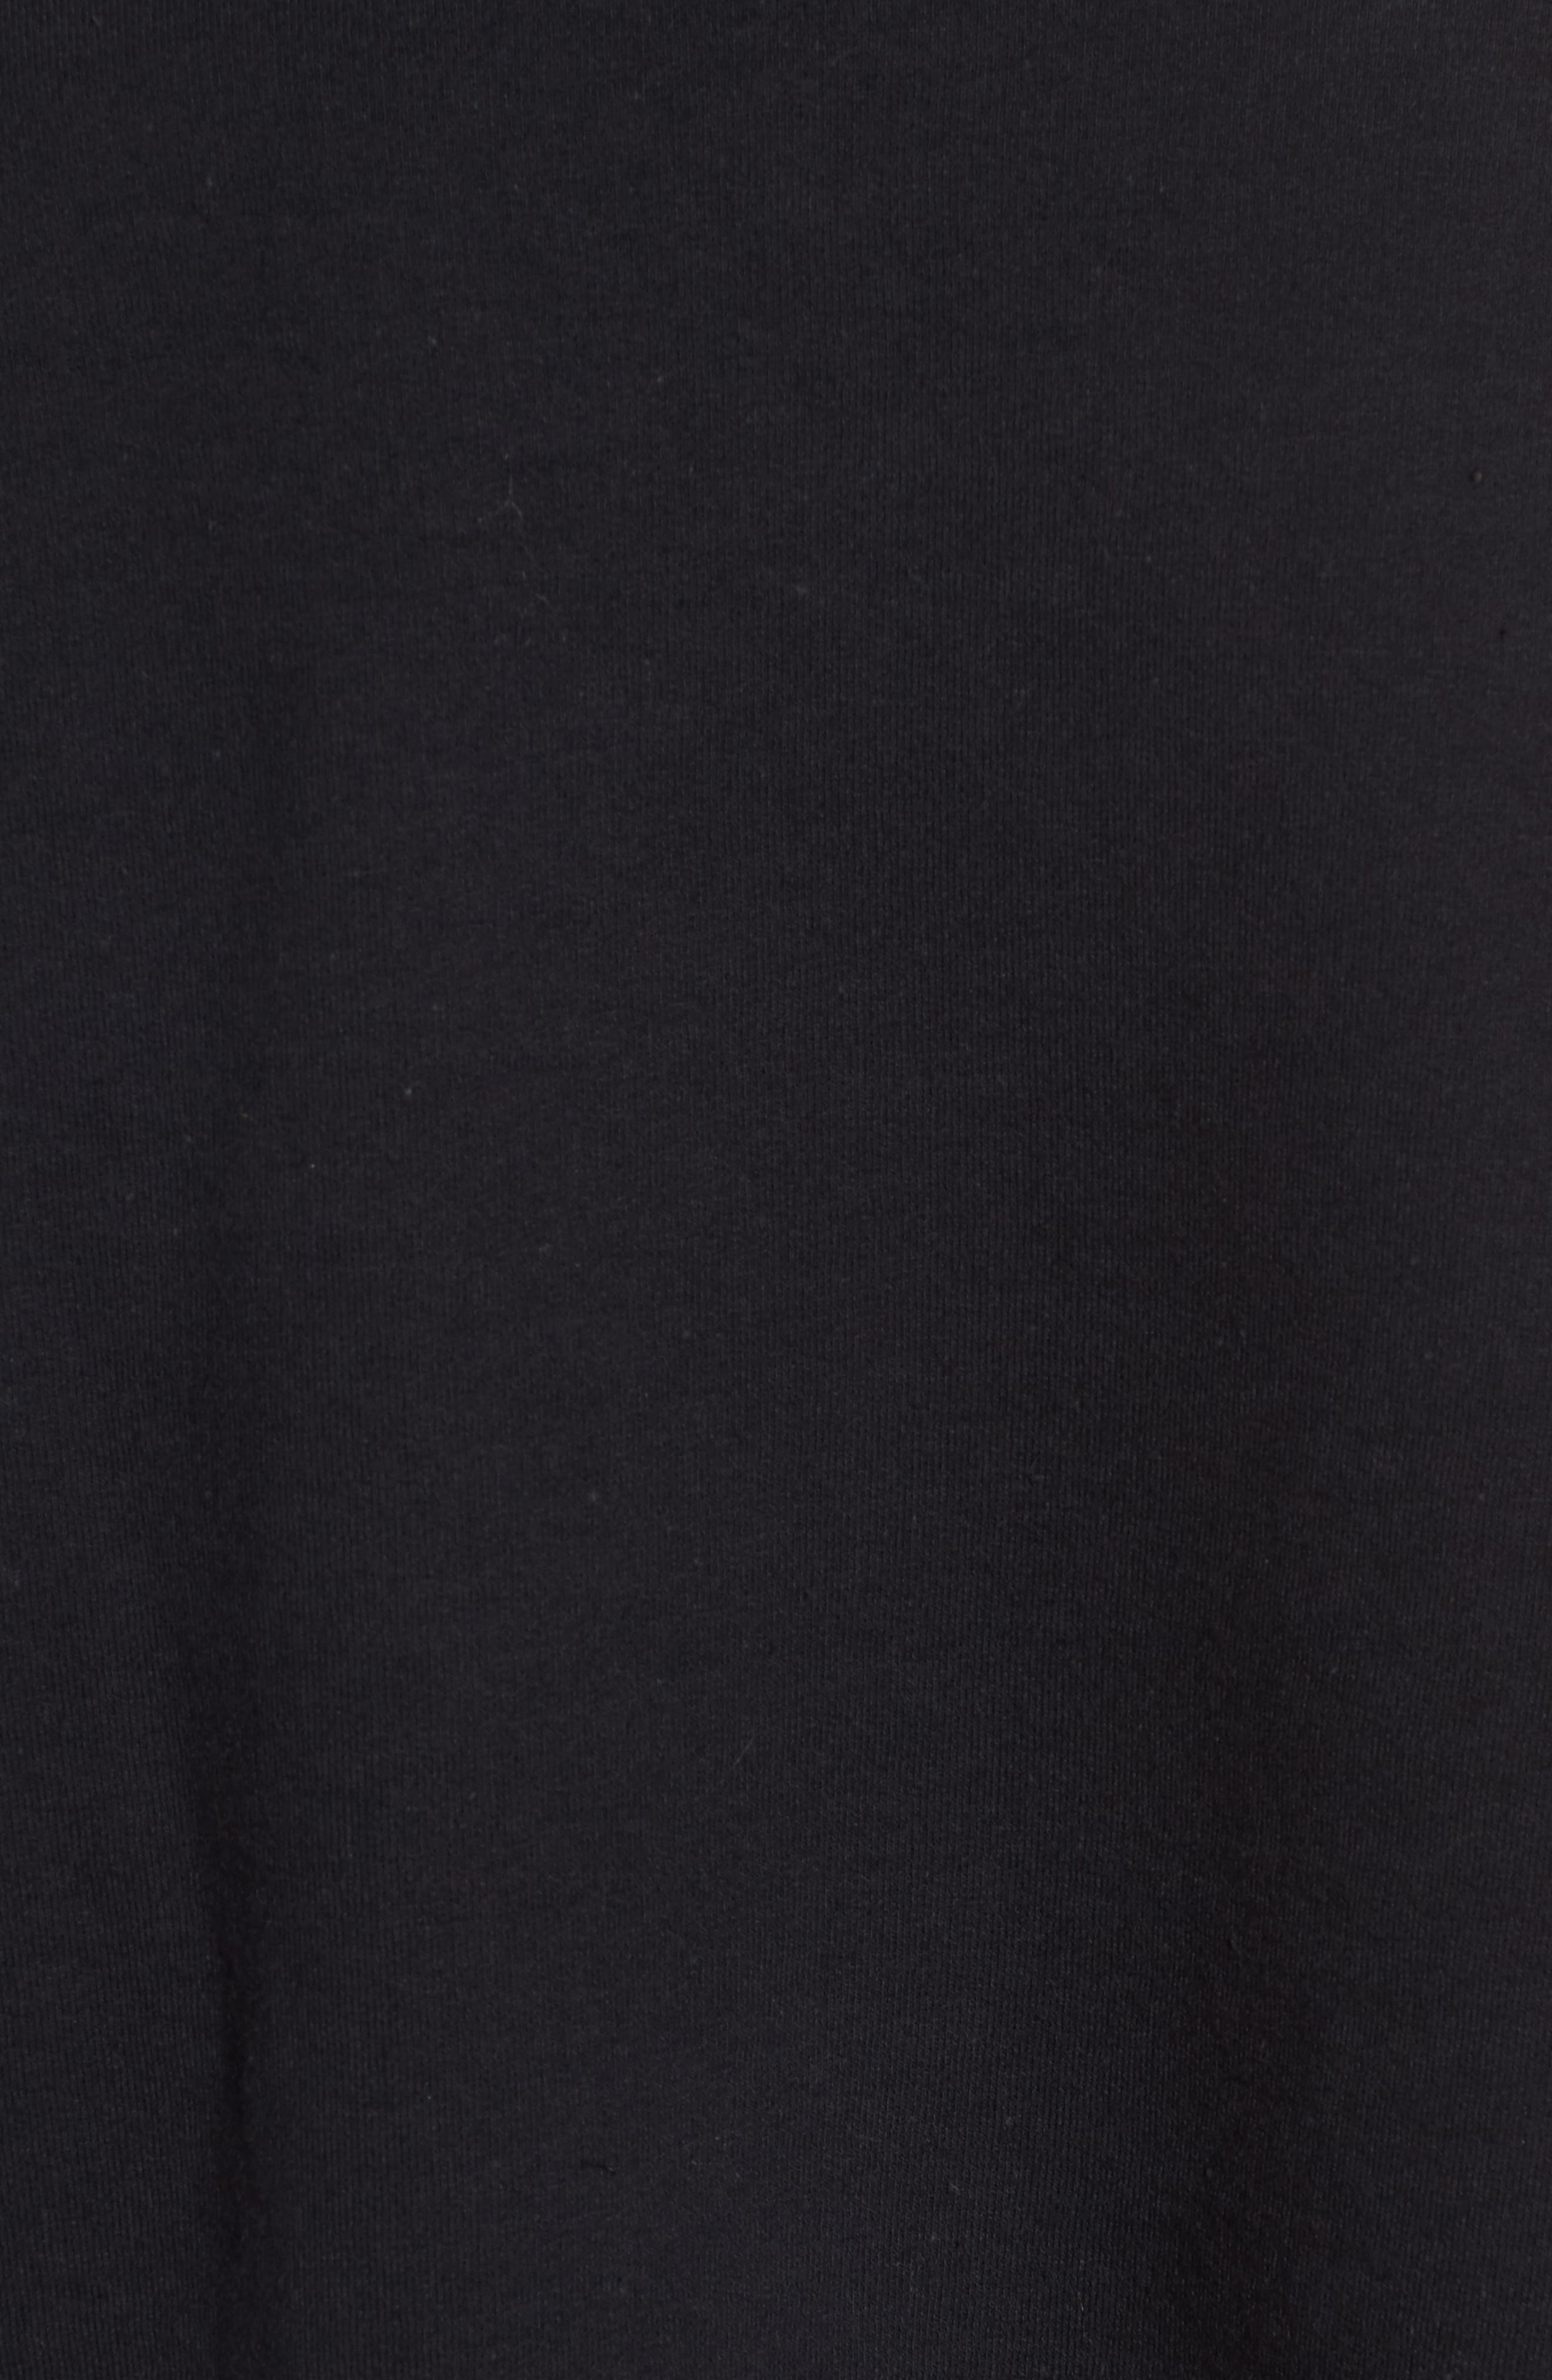 Mistletoe Sweatshirt,                             Alternate thumbnail 5, color,                             001